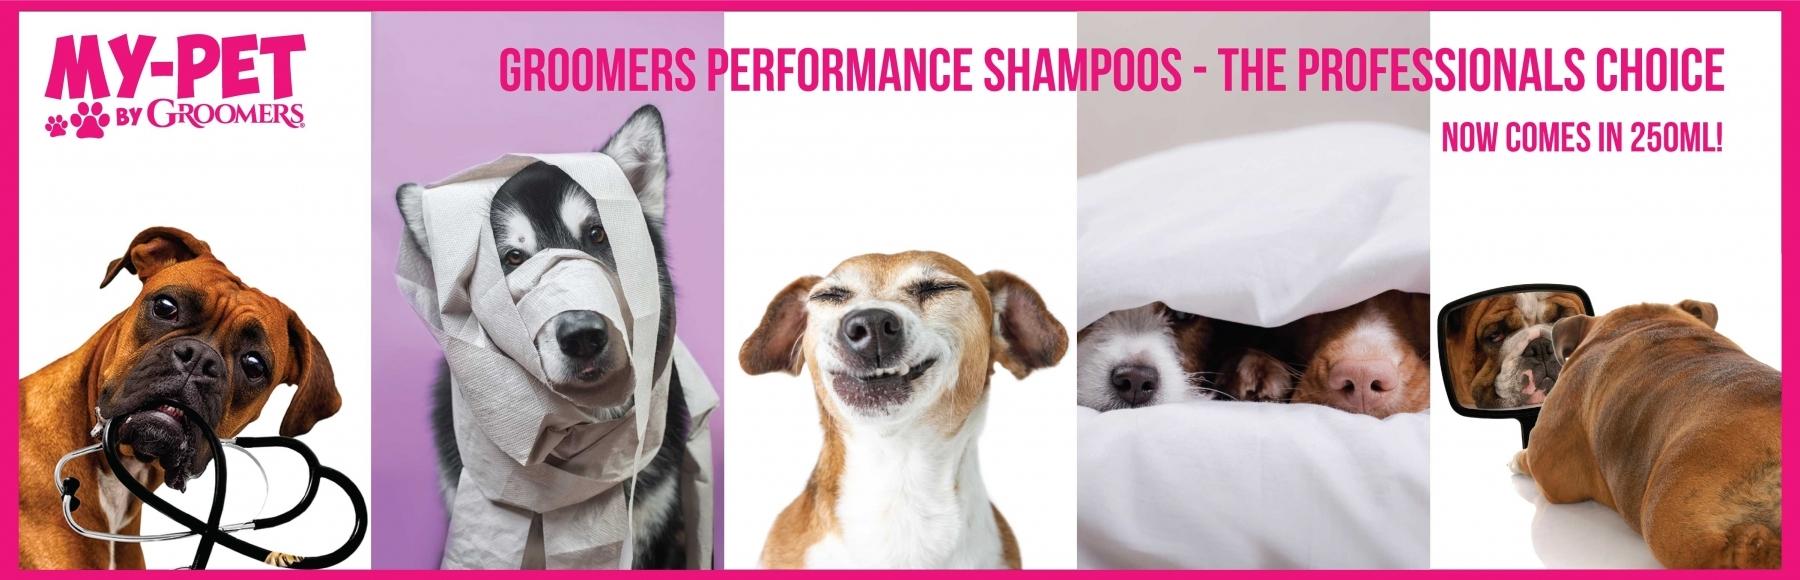 250ml Performance Shampoos